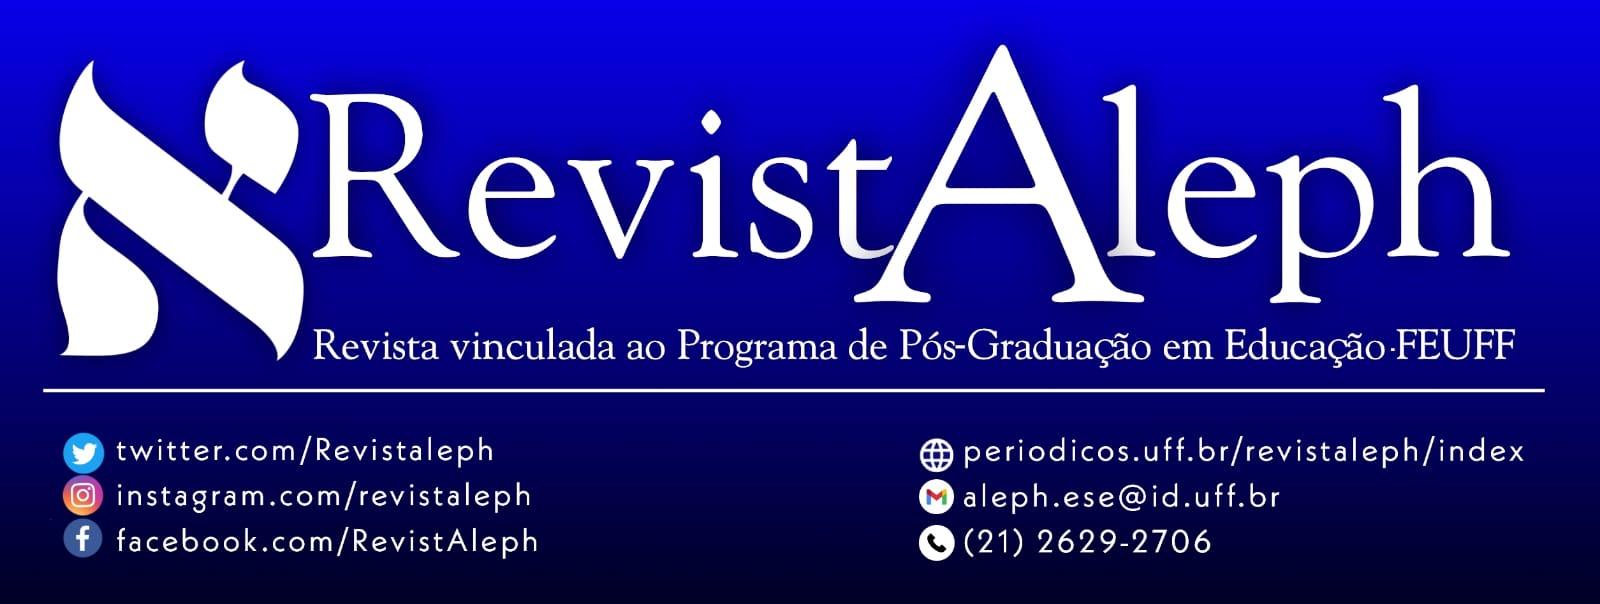 Revista Aleph - ISSN: 18076211 - Temos página no facebook. E-mail: aleph.ese@id.uff.br